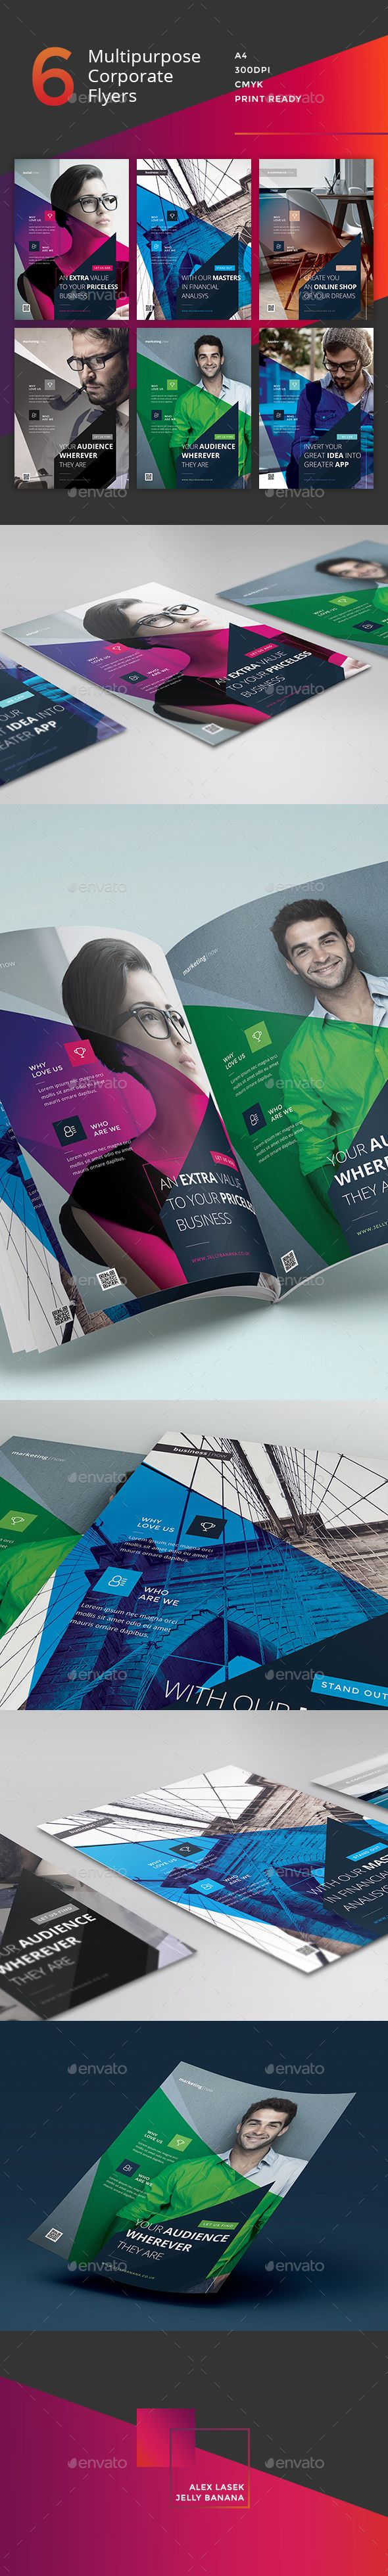 Corporate Flyer - 6 Multipurpose Business Template PSD #design Download: http://graphicriver.net/item/corporate-flyer-6-multipurpose-business-template/13721438?ref=ksioks